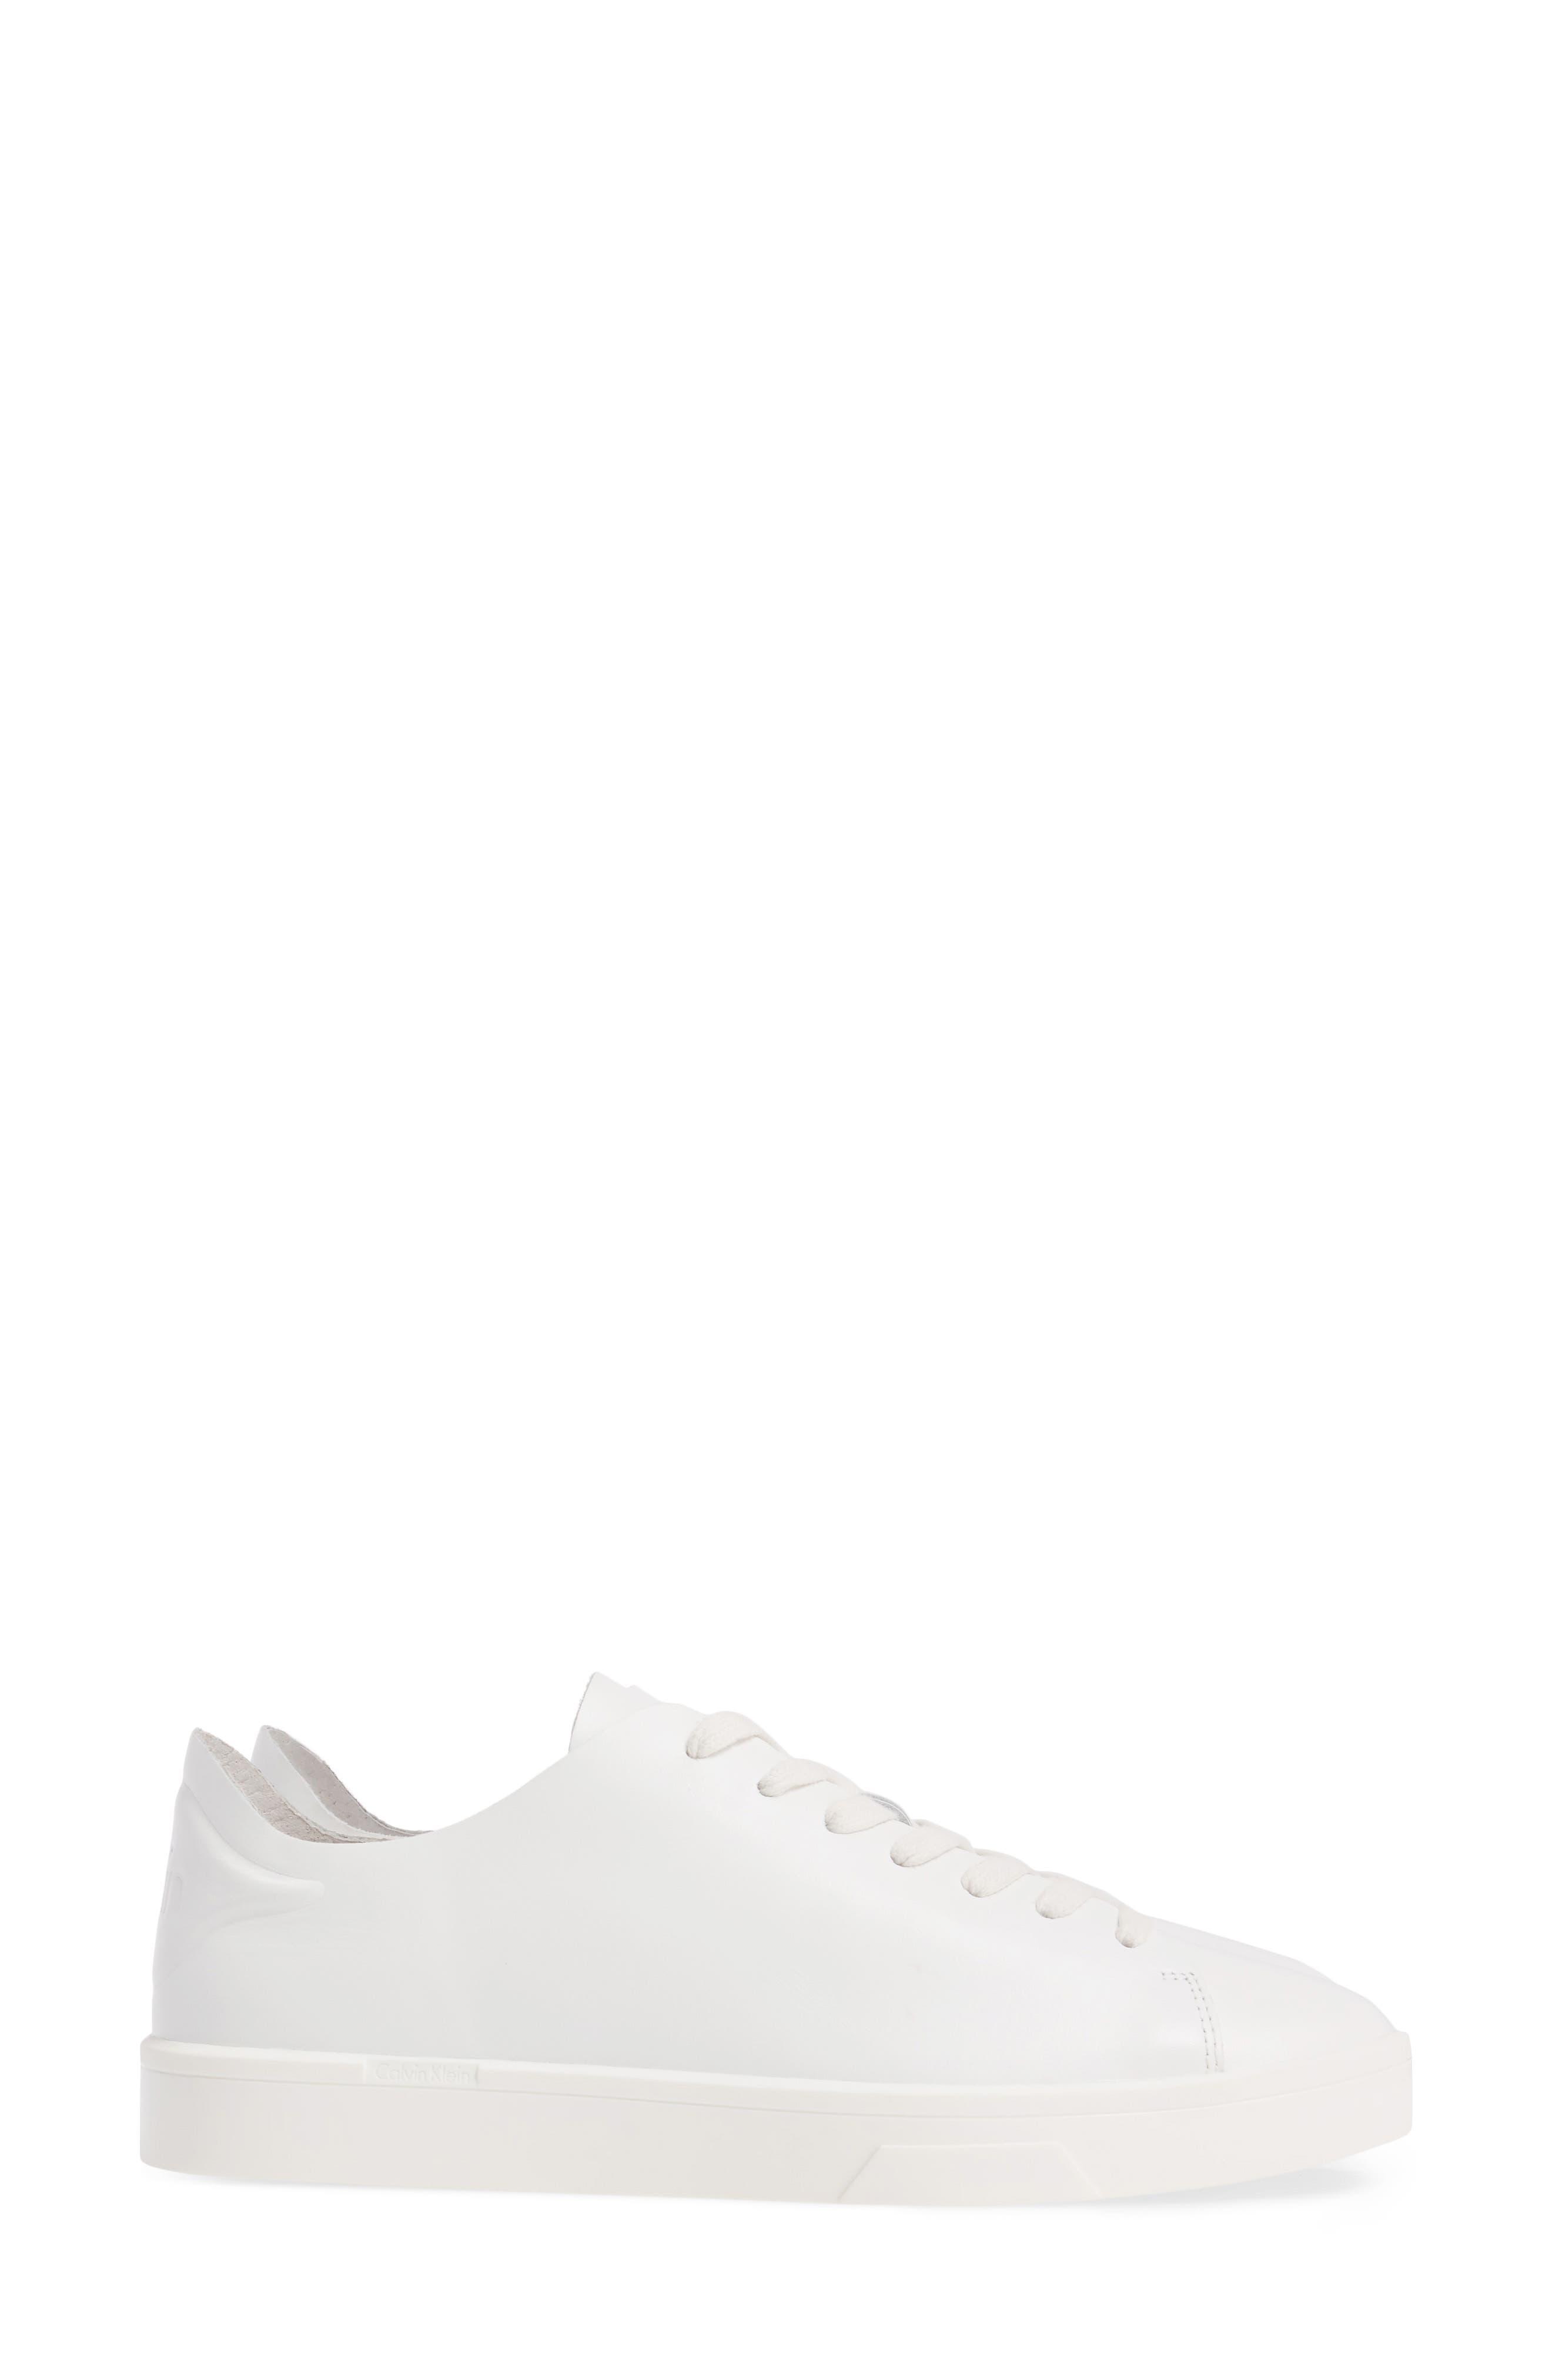 Irena Sneaker,                             Alternate thumbnail 3, color,                             134